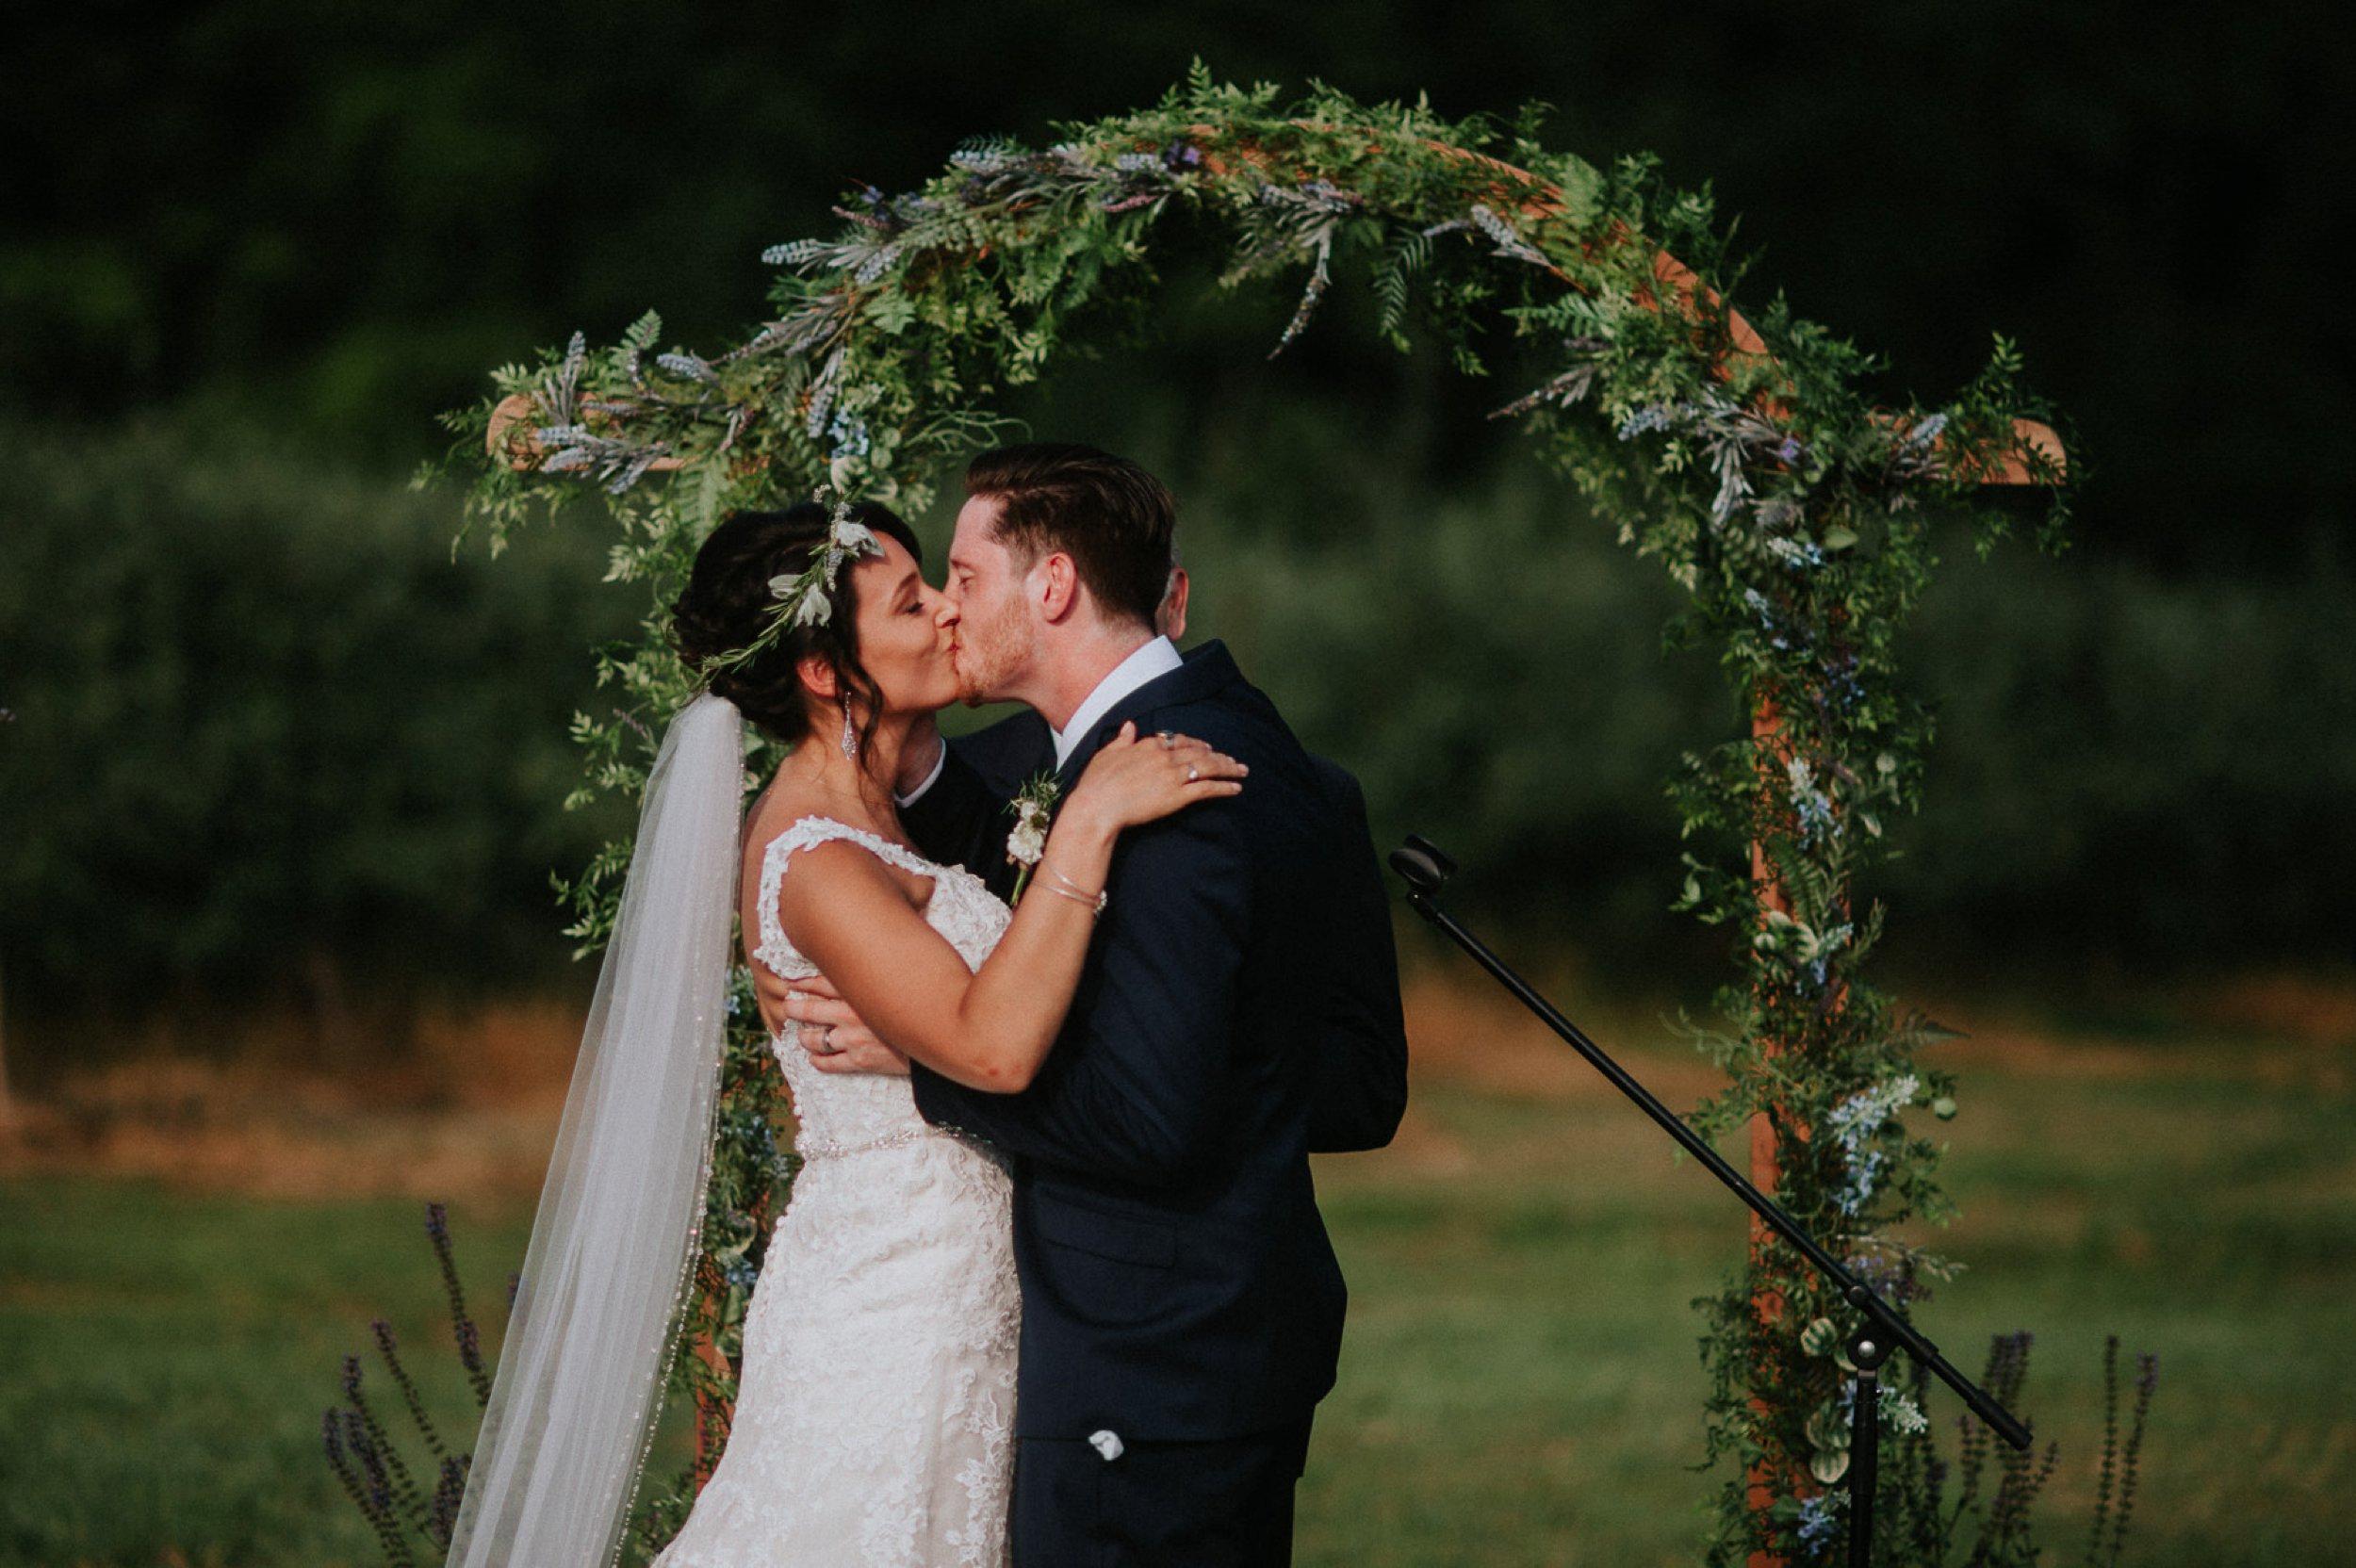 milburn_farms-wedding-41.jpg